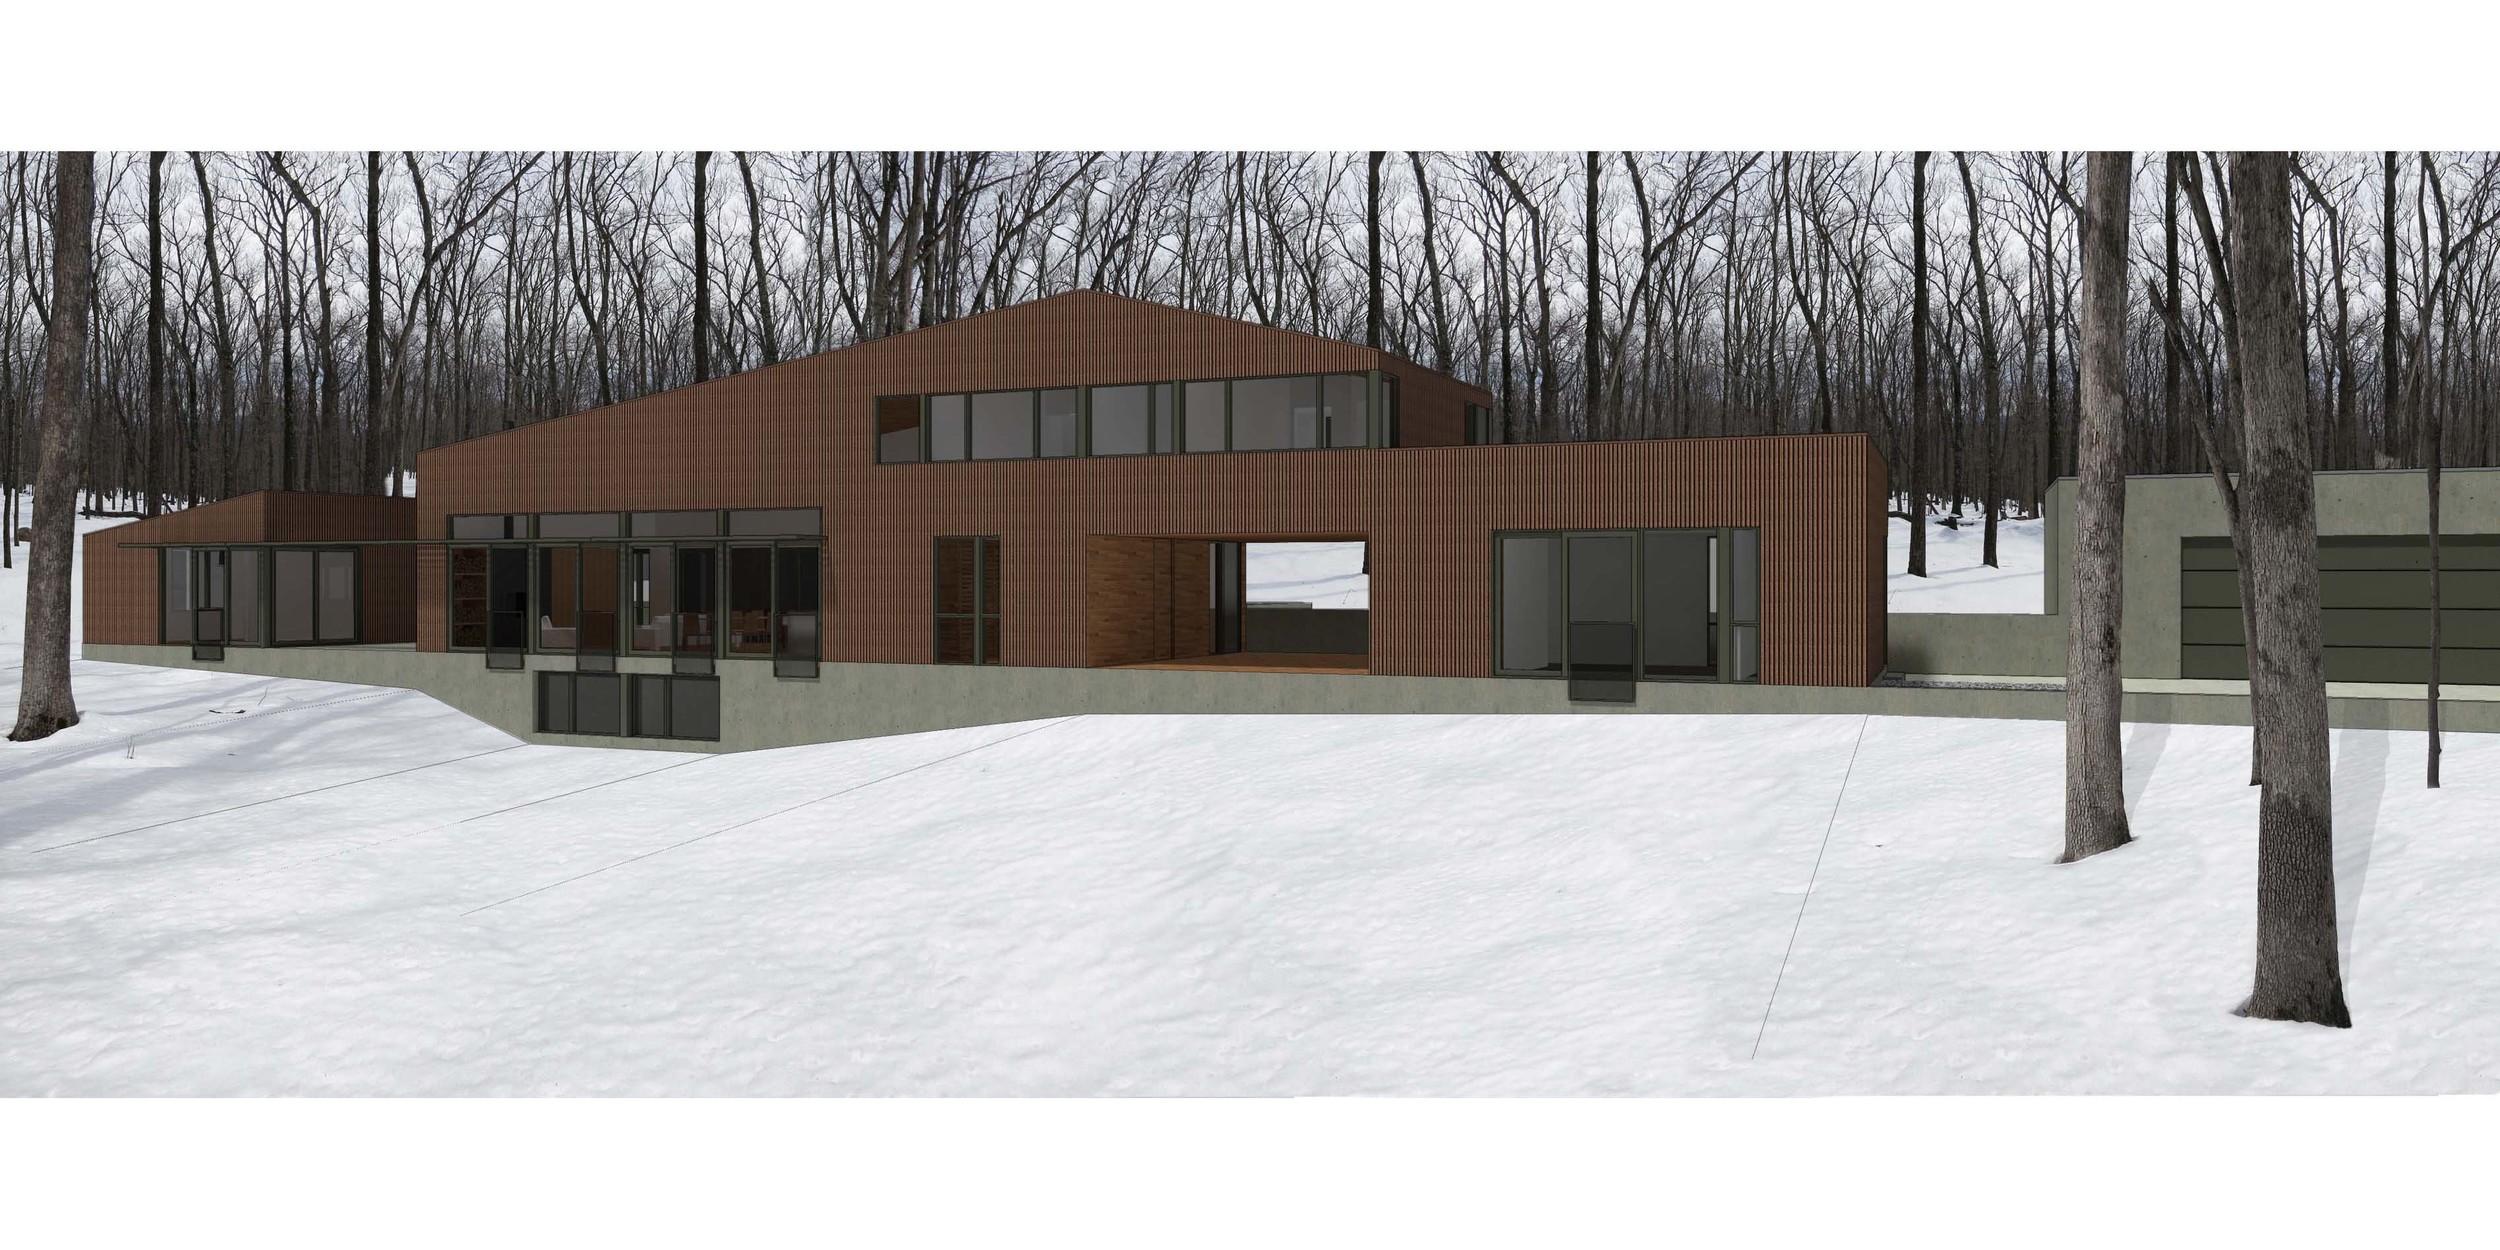 Exterior View 2.jpg